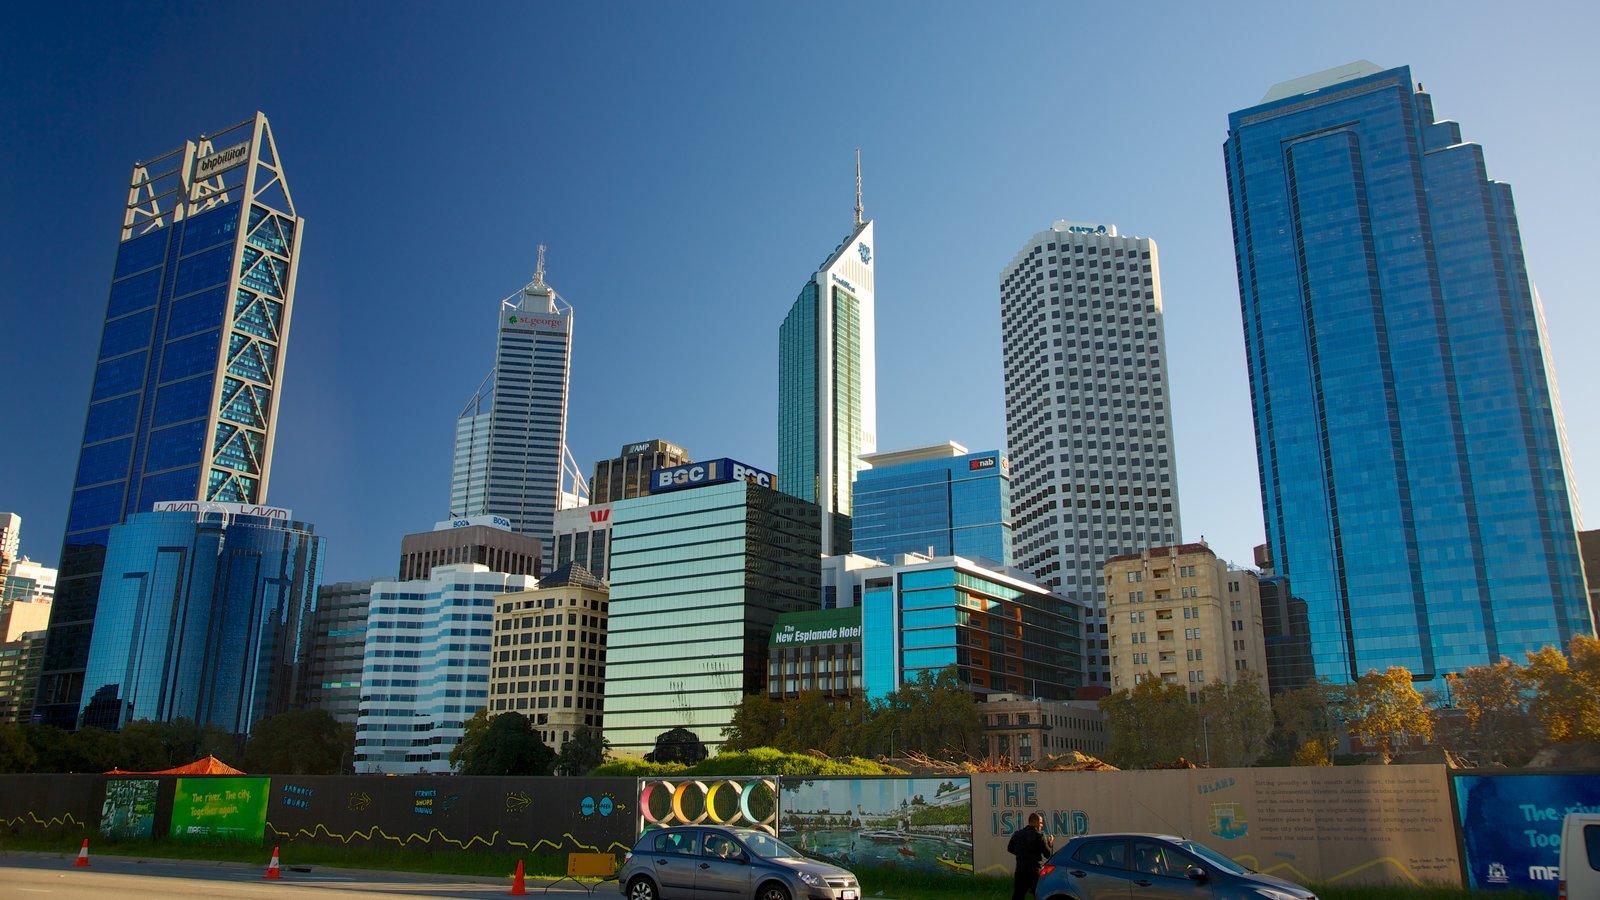 Swan Bells Belltower que incluye un rascacielos, arquitectura moderna y horizonte